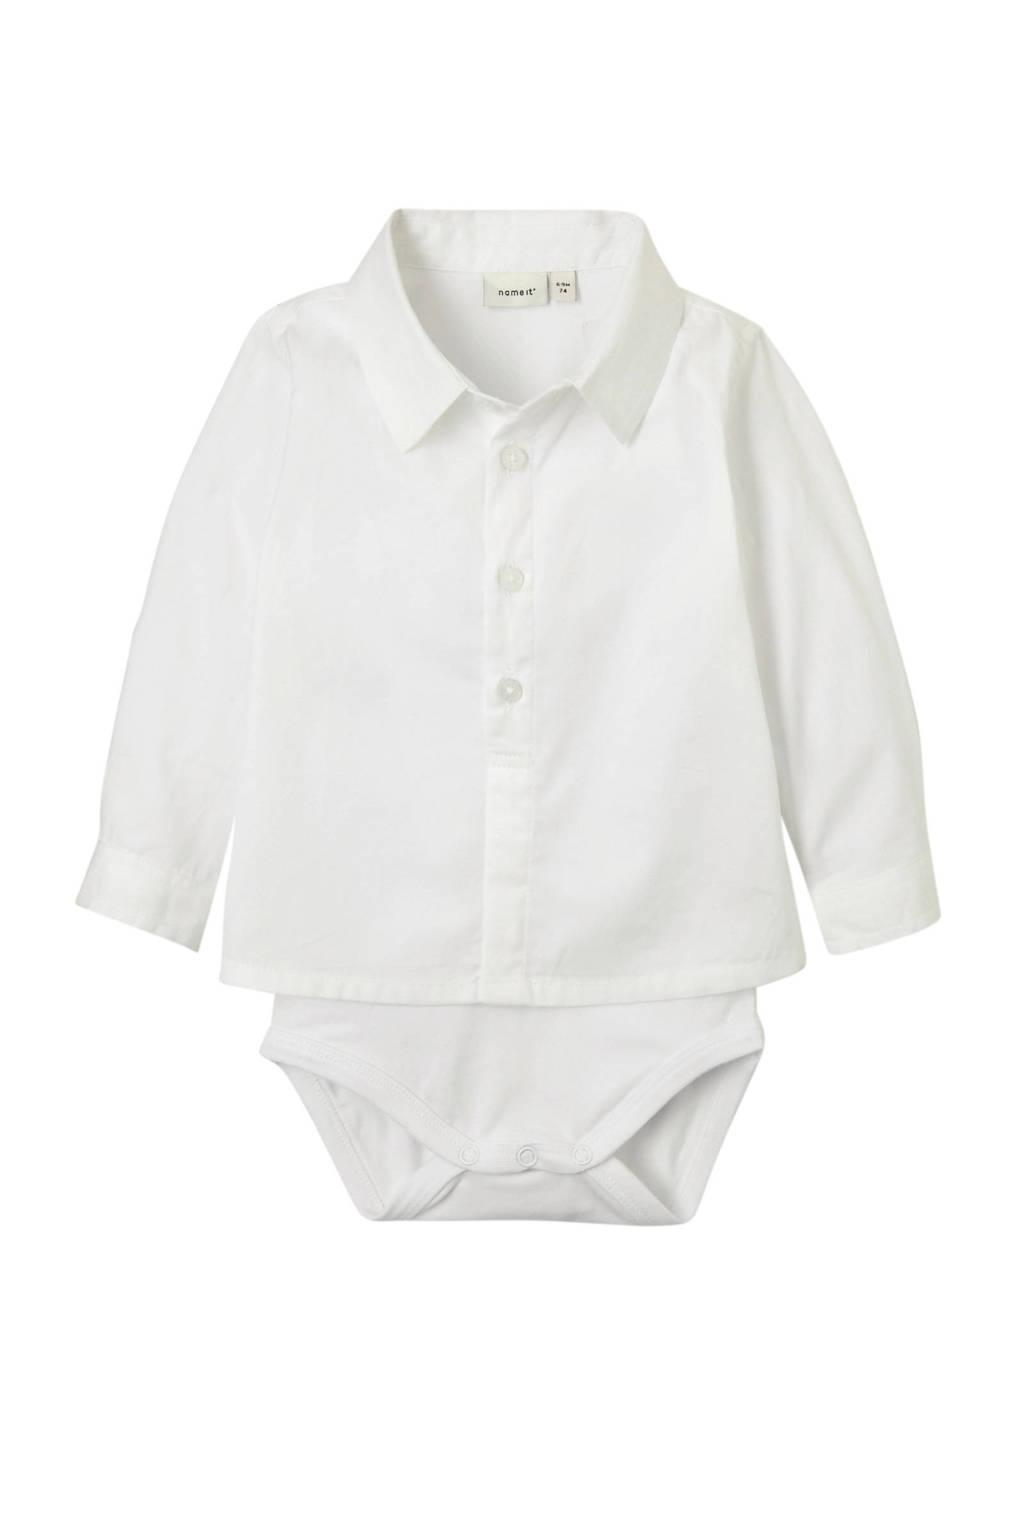 NAME IT BABY overhemd romper Sander, Wit